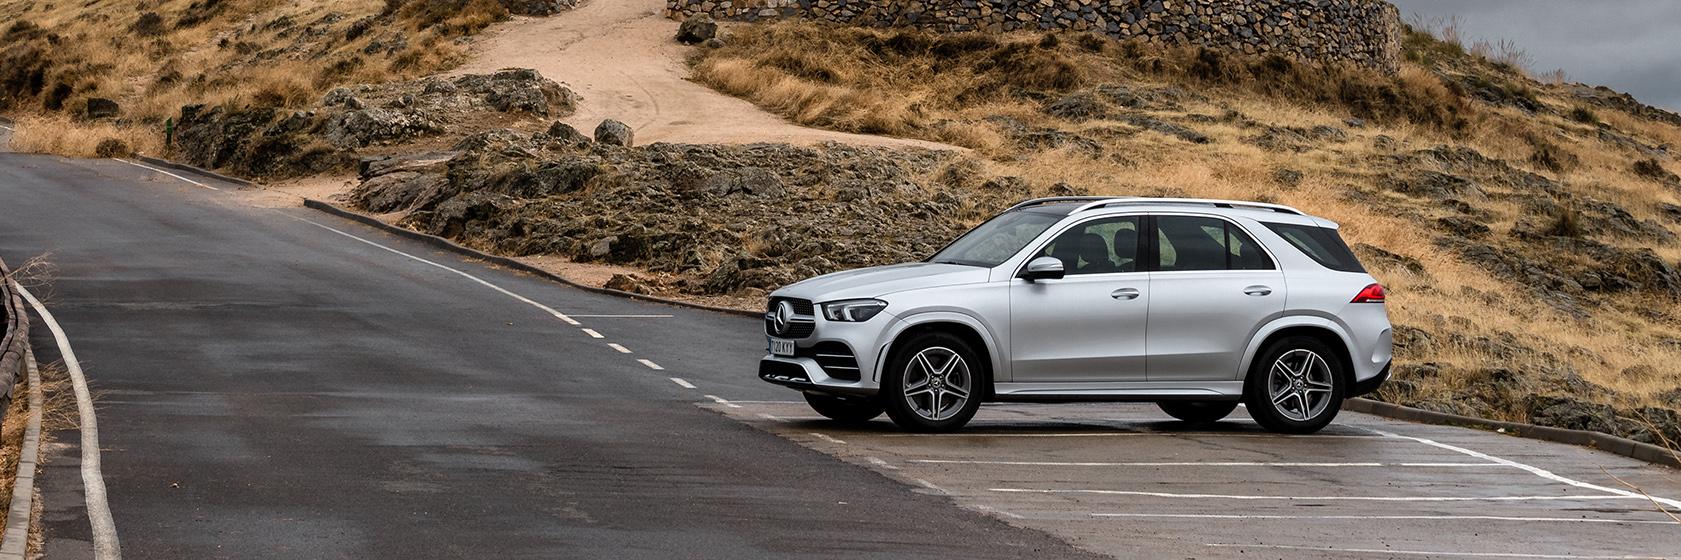 GLE Mercedes-Benz SUV